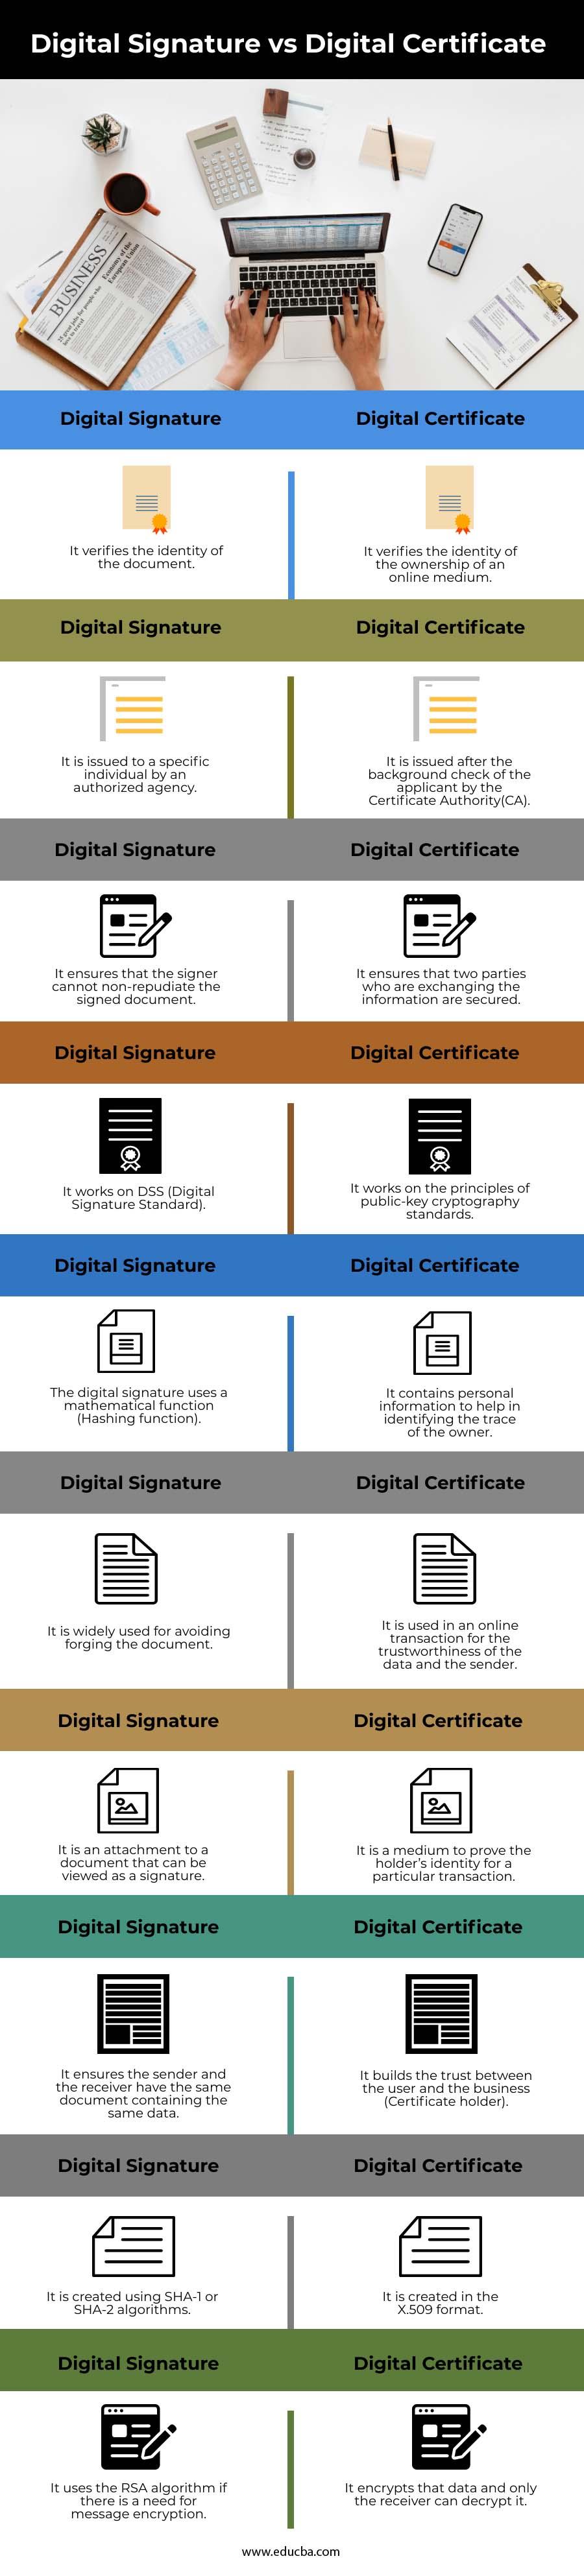 Digital Signature vs Digital Certificate info